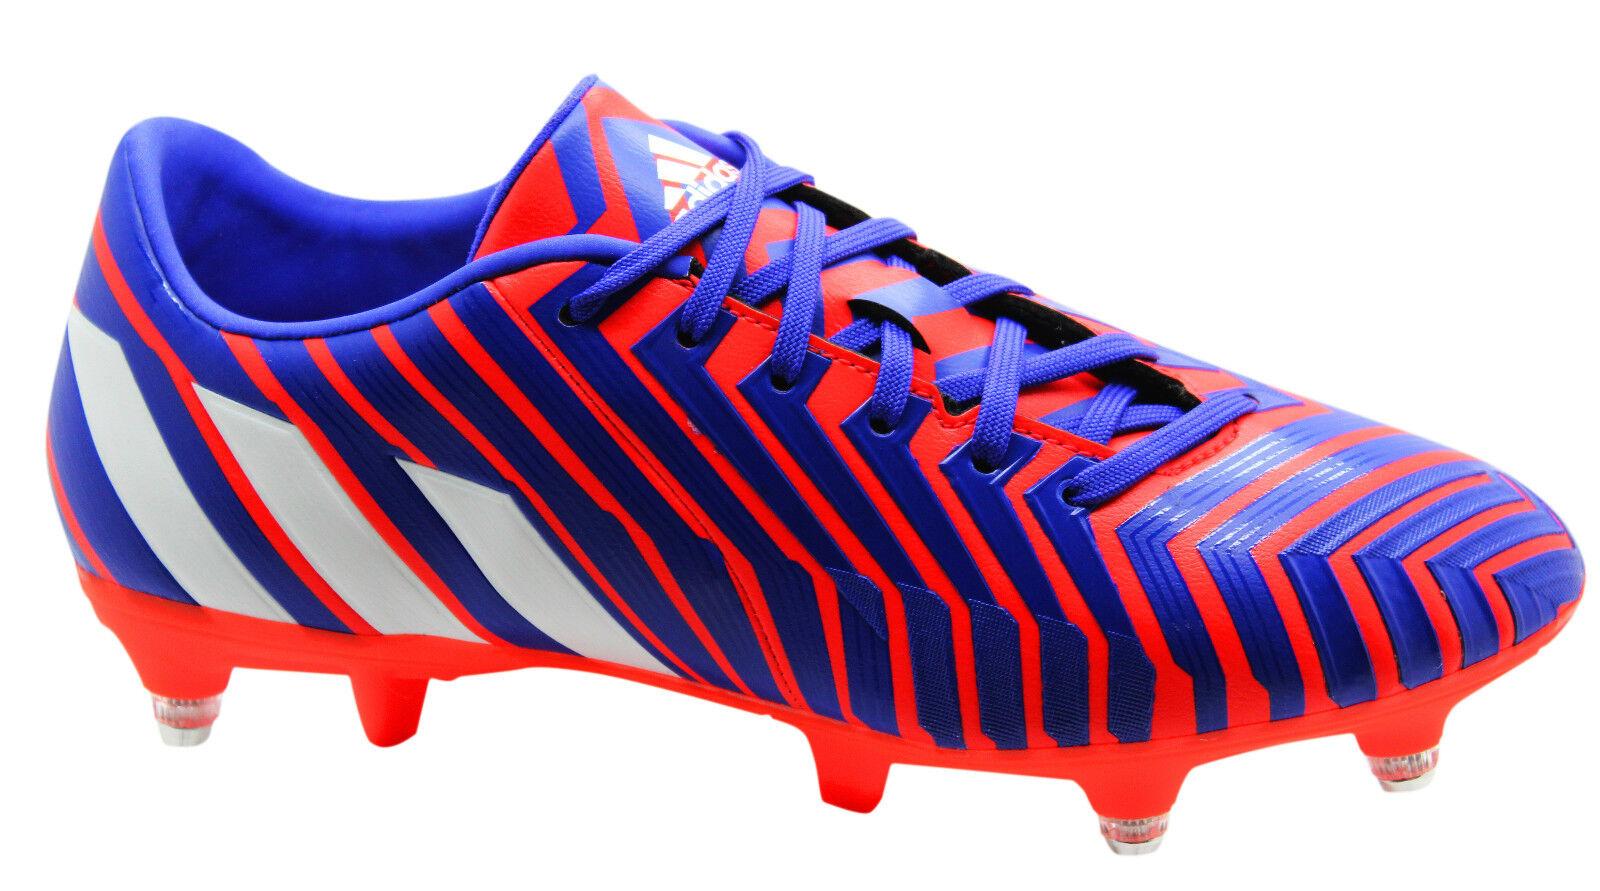 outlet store 510c1 b93d0 Adidas Predator Absolado Instinct SG doux Terrain Hommes Chaussures de  football